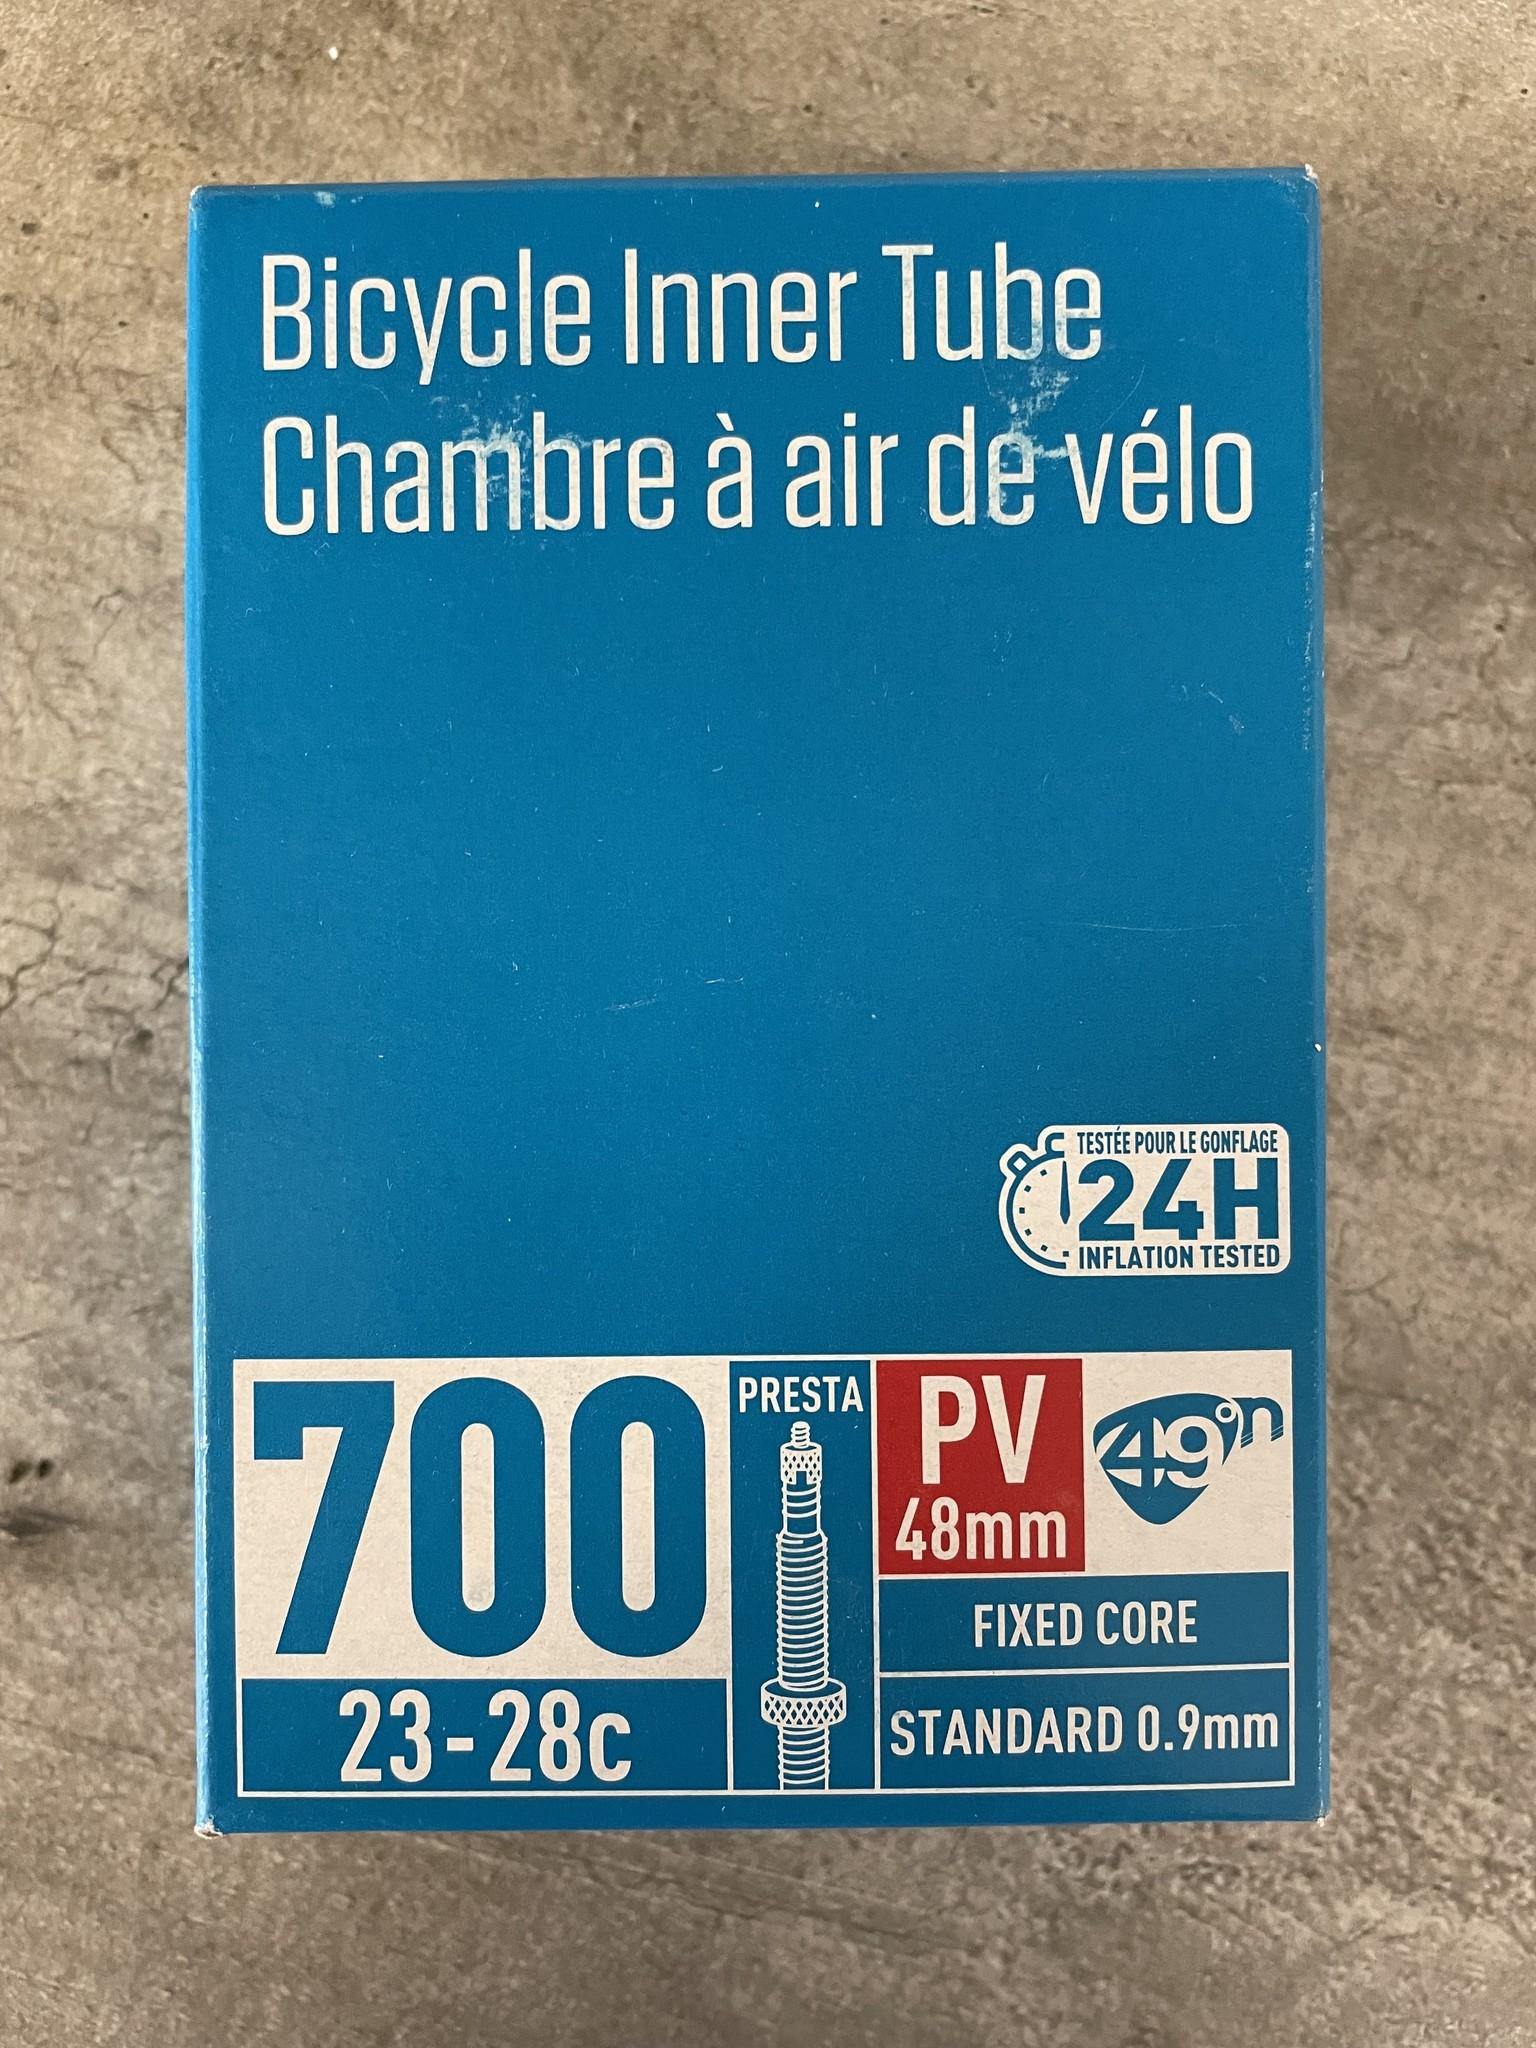 Bicycle Inner Tube 700 x 23-28c